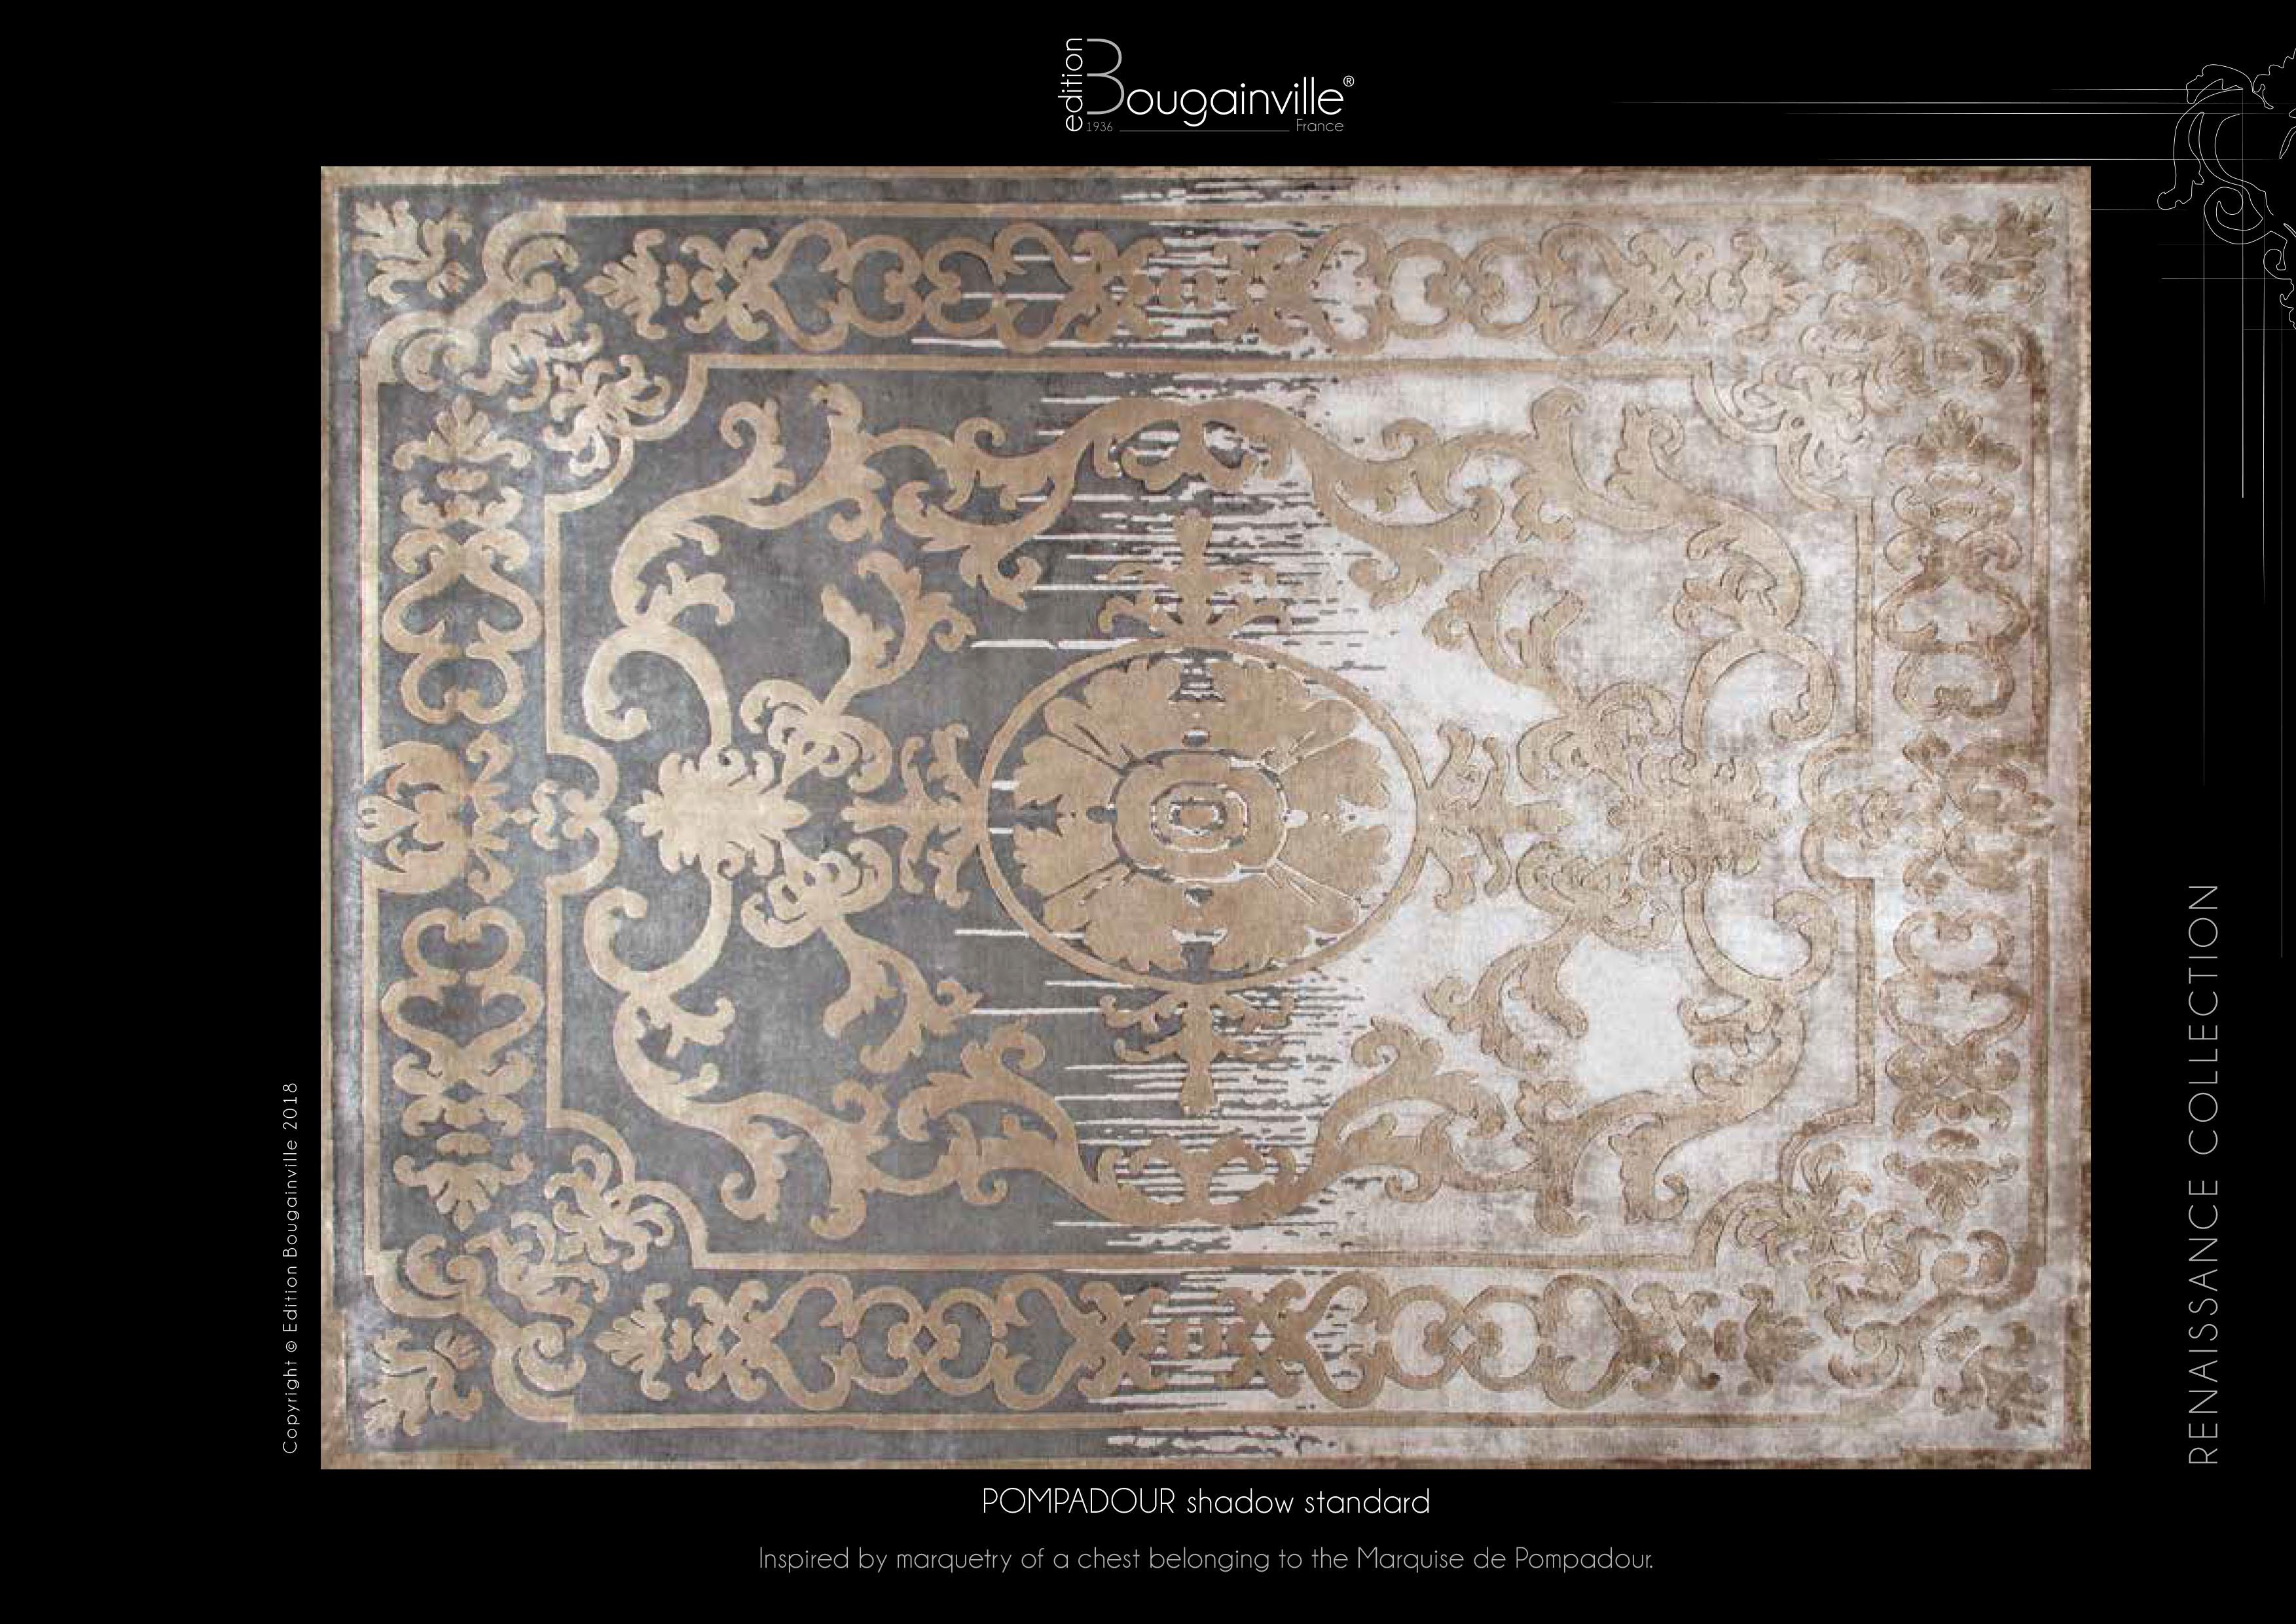 Ковер Edition Bougainville, POMPADOUR shadow standard